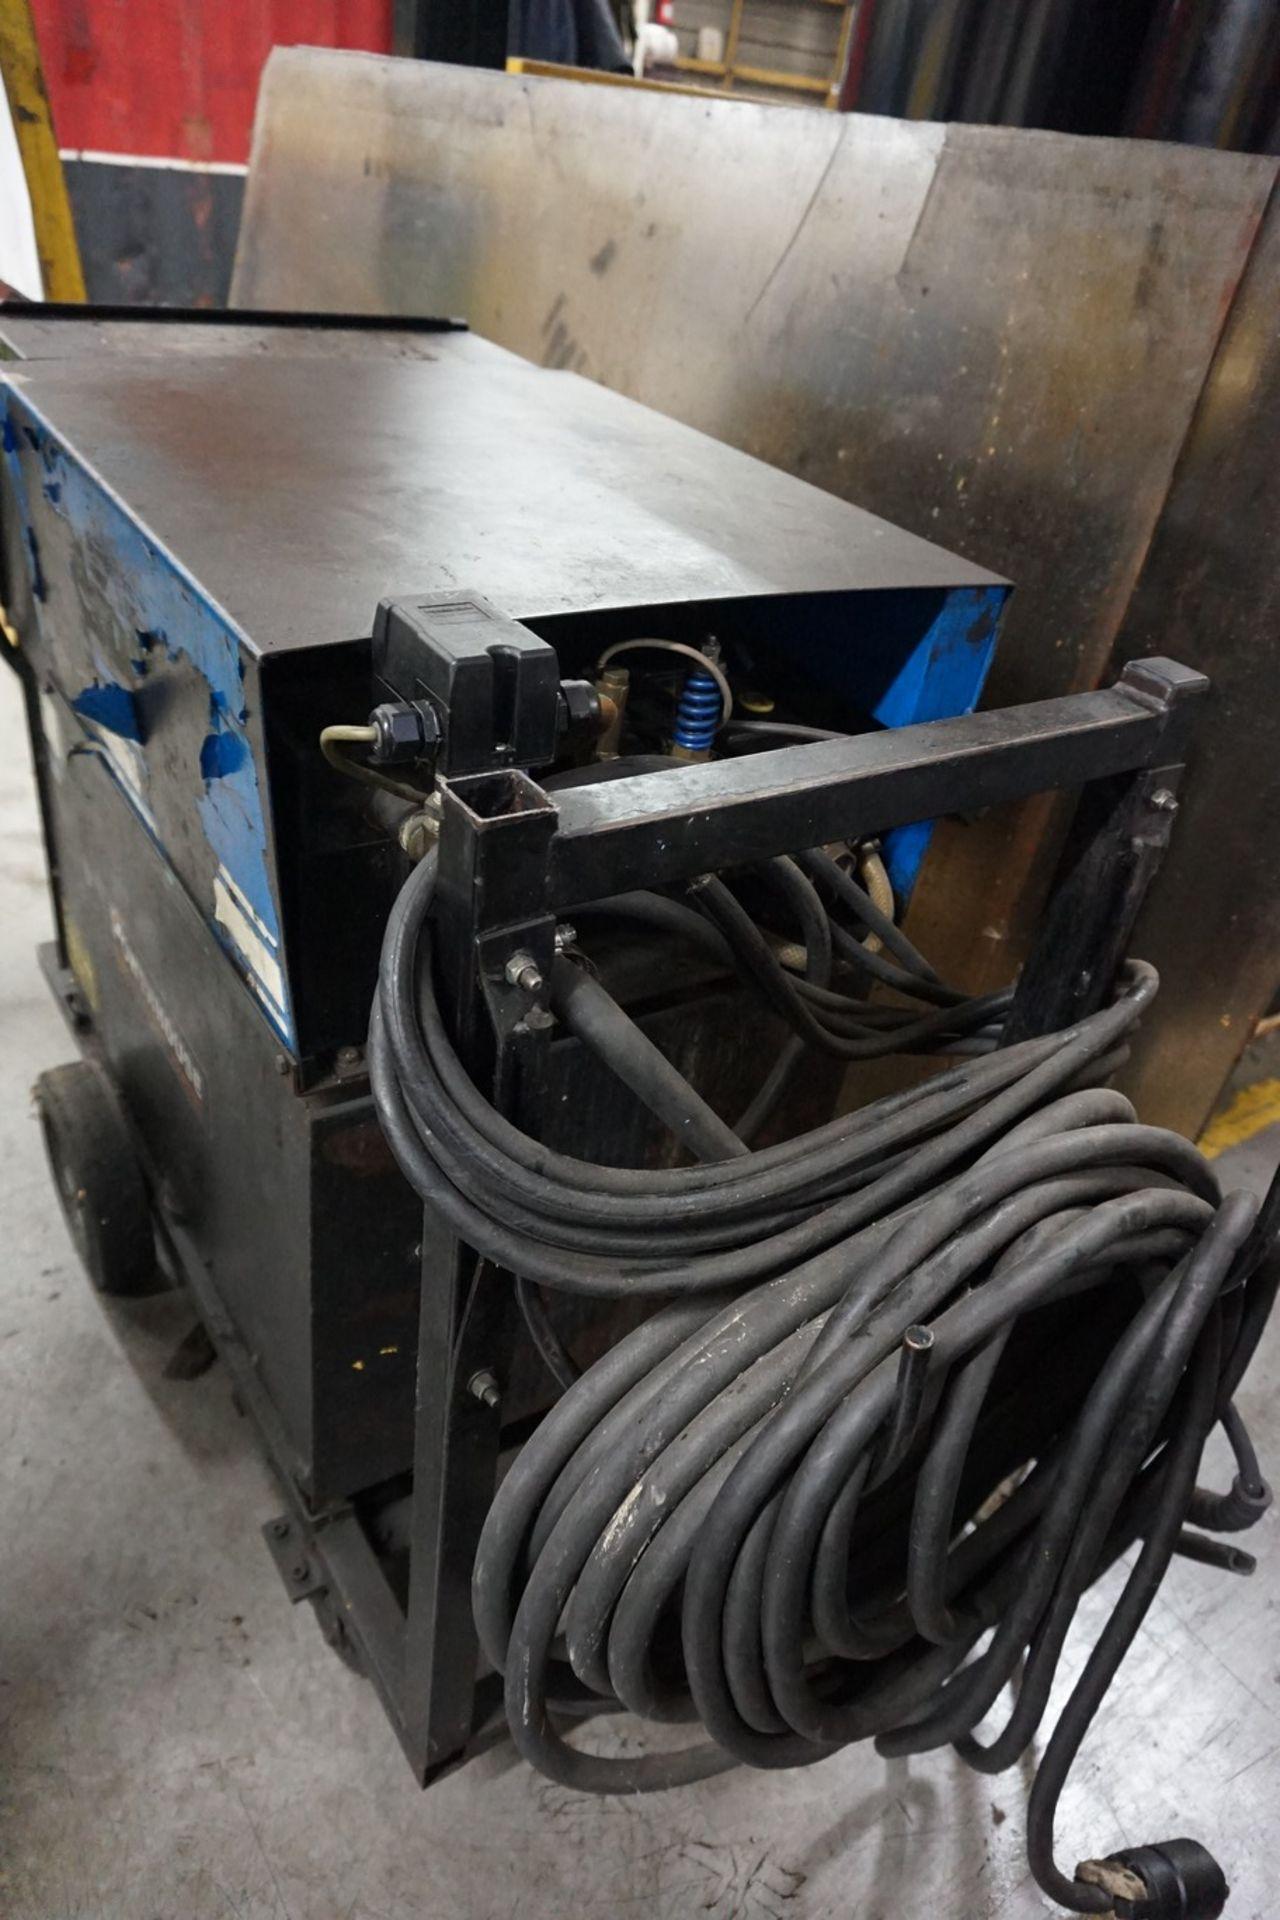 Epps Model Powerhouse 3200S Pressure Washer - Image 2 of 3